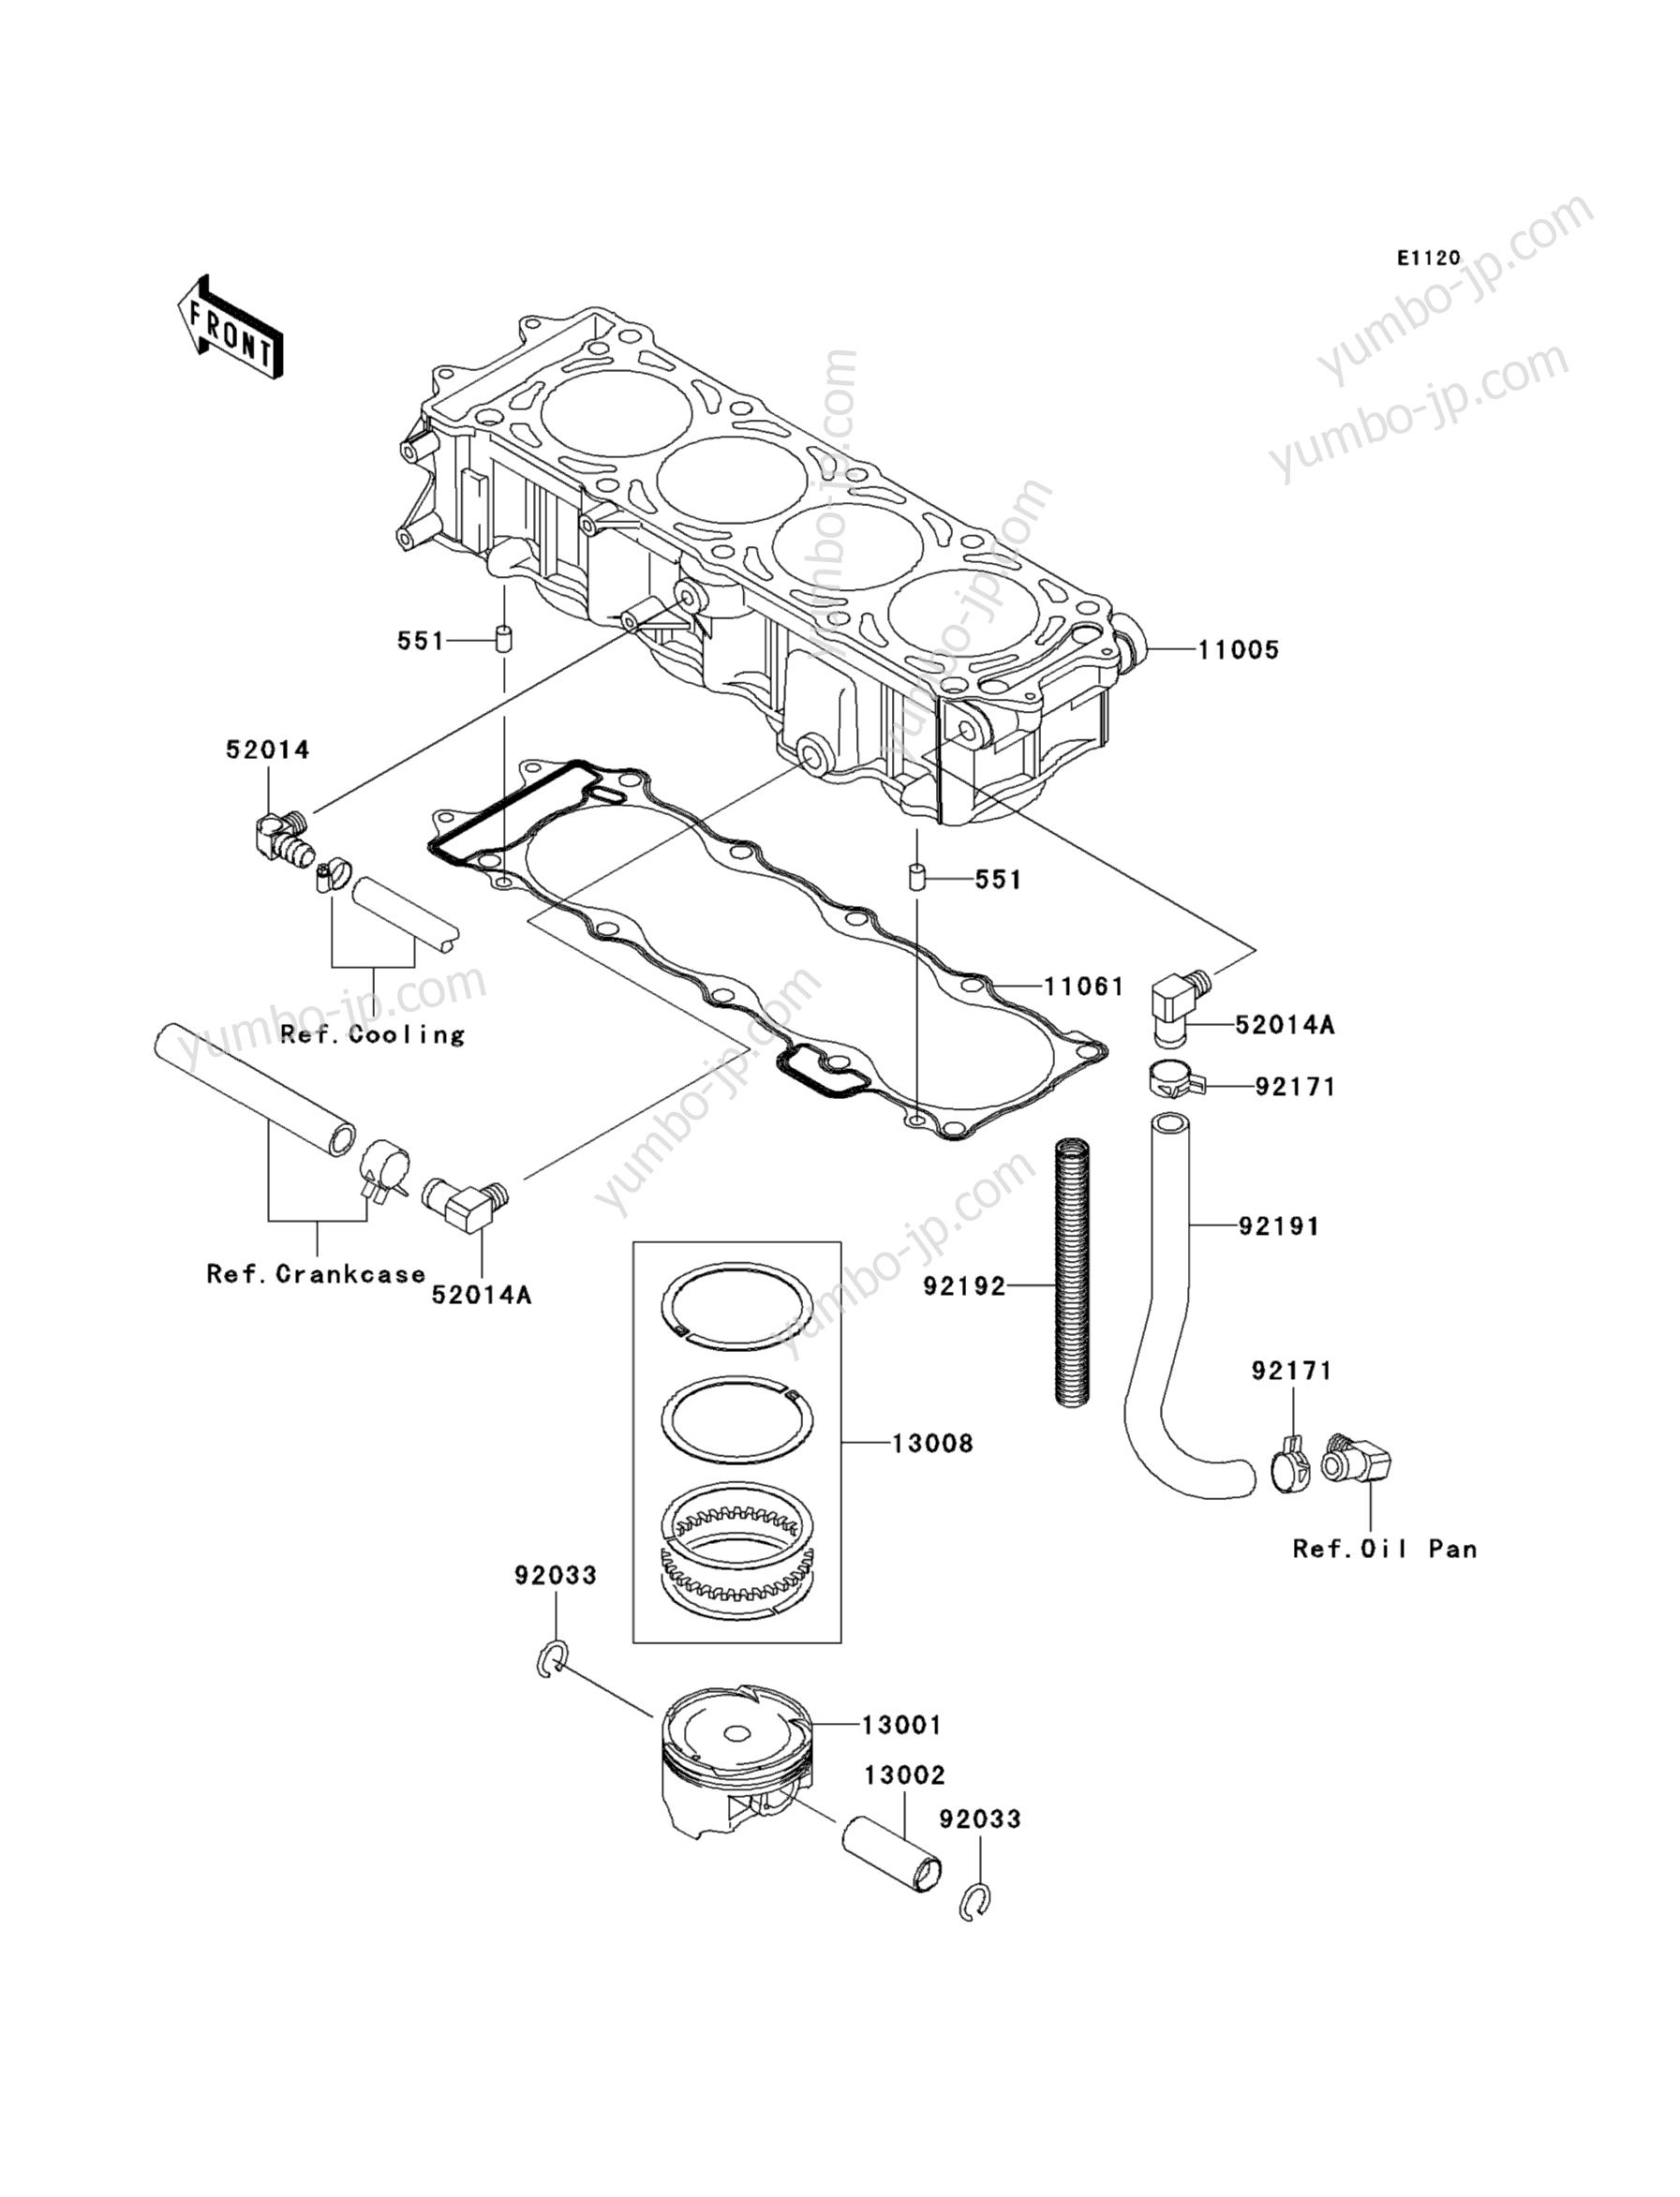 Cylinder/Piston(s) для гидроцикла KAWASAKI JET SKI STX-15F (JT1500-A2) 2005 г.